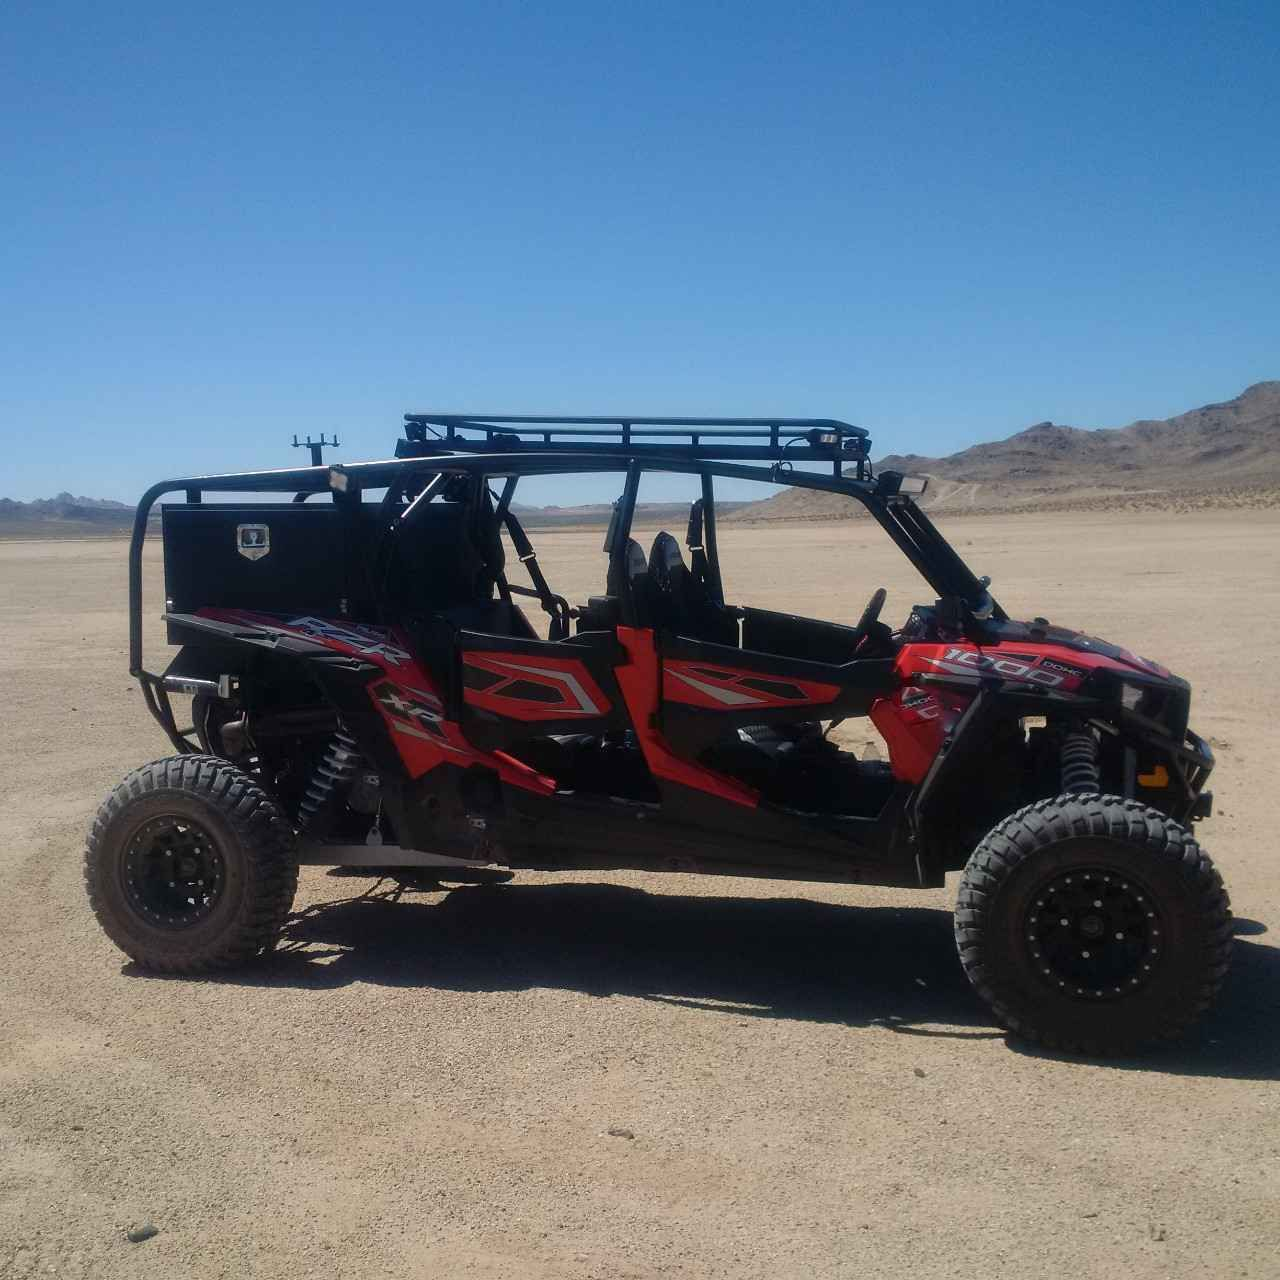 Used 2016 Polaris Rzr Xp 4 1000 Eps Atvs For Sale In California On Atv Trades Polaris Rzr Xp Rzr Polaris Rzr